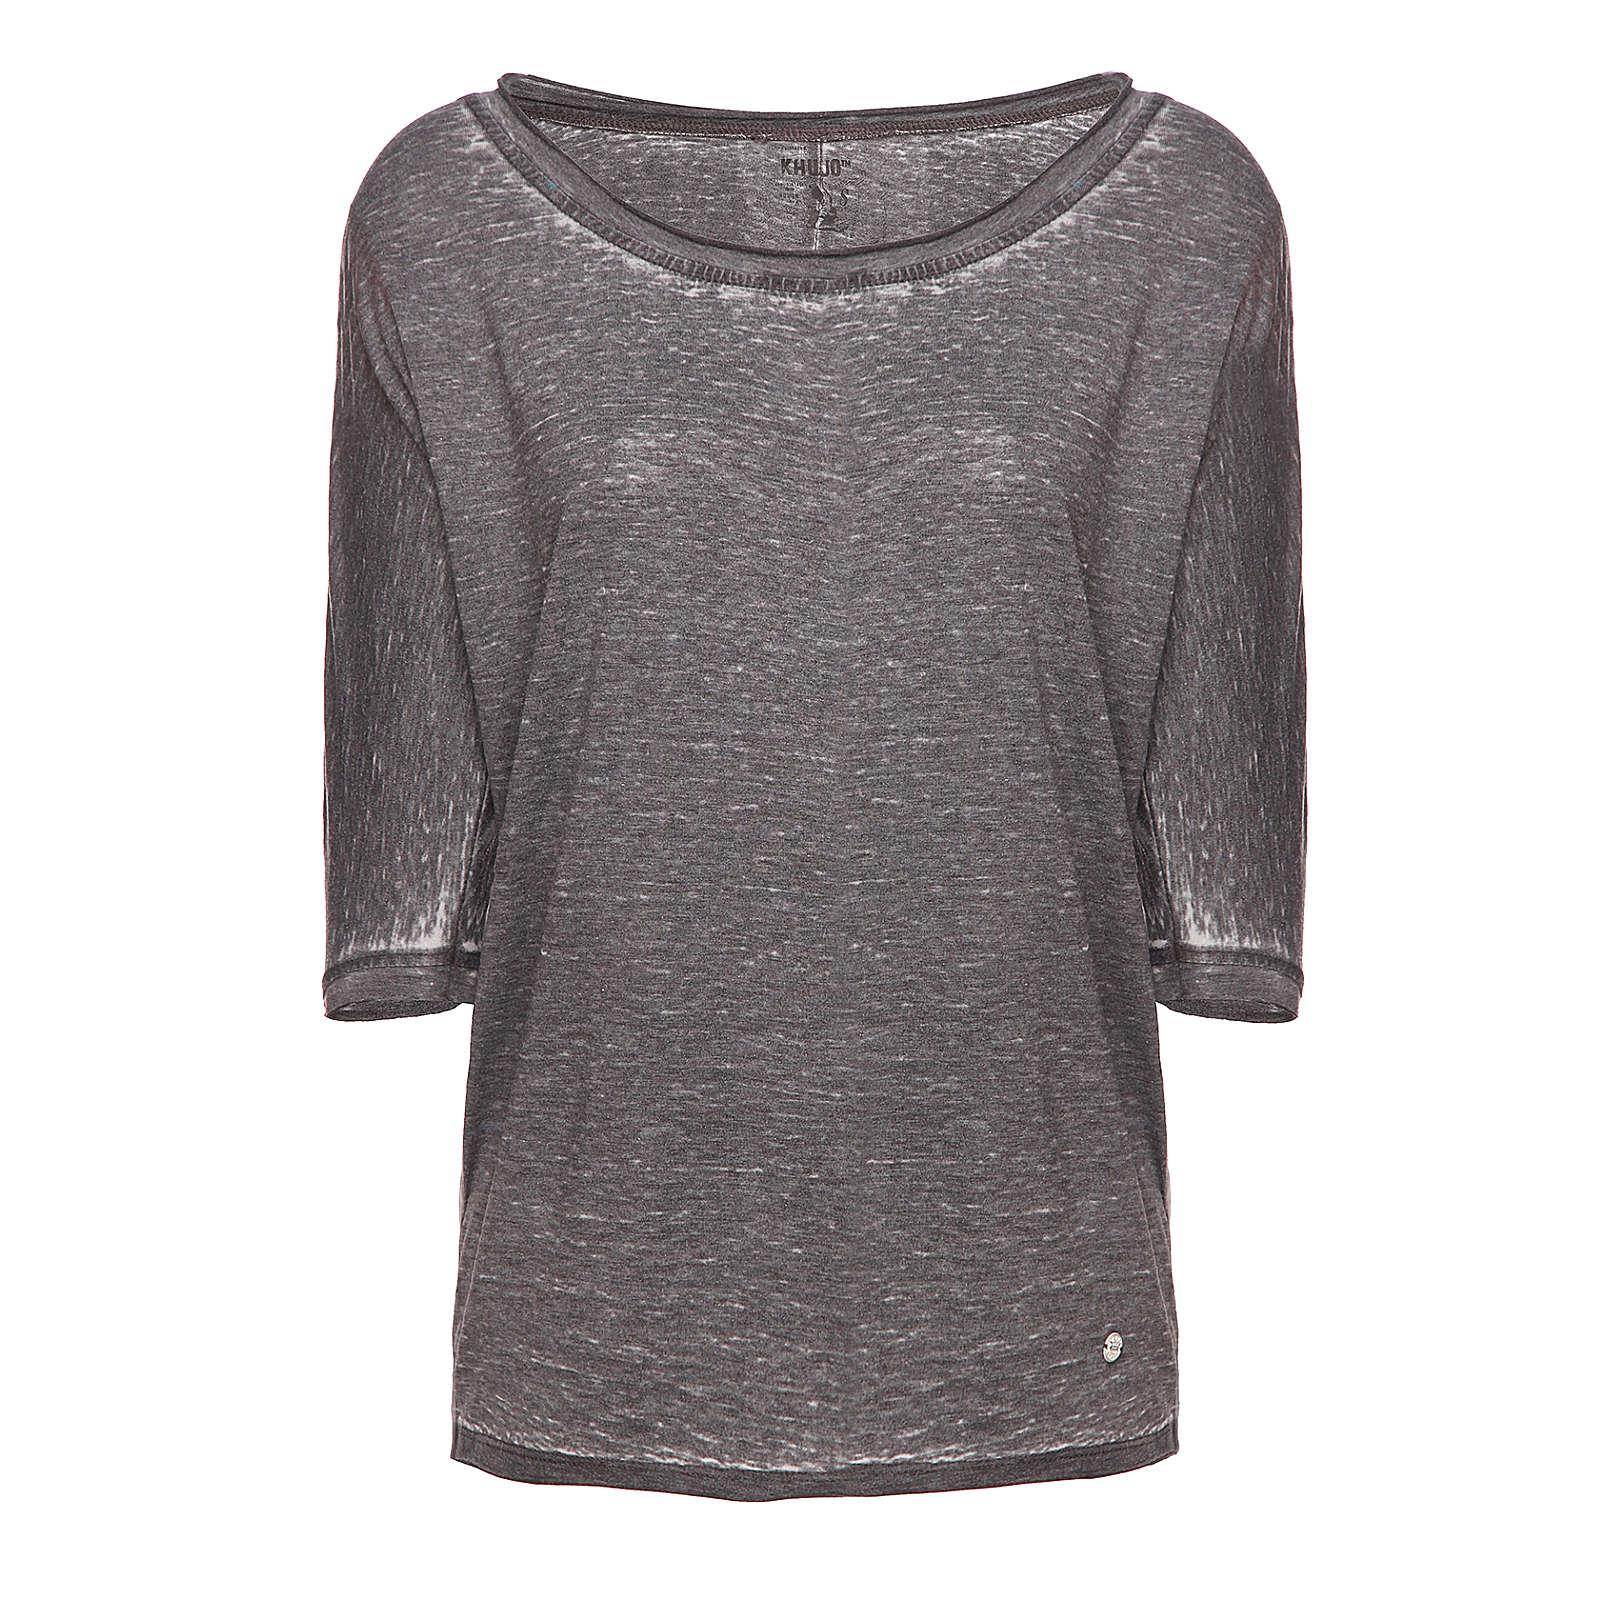 Khujo T-Shirt schwarz Damen Gr. 38